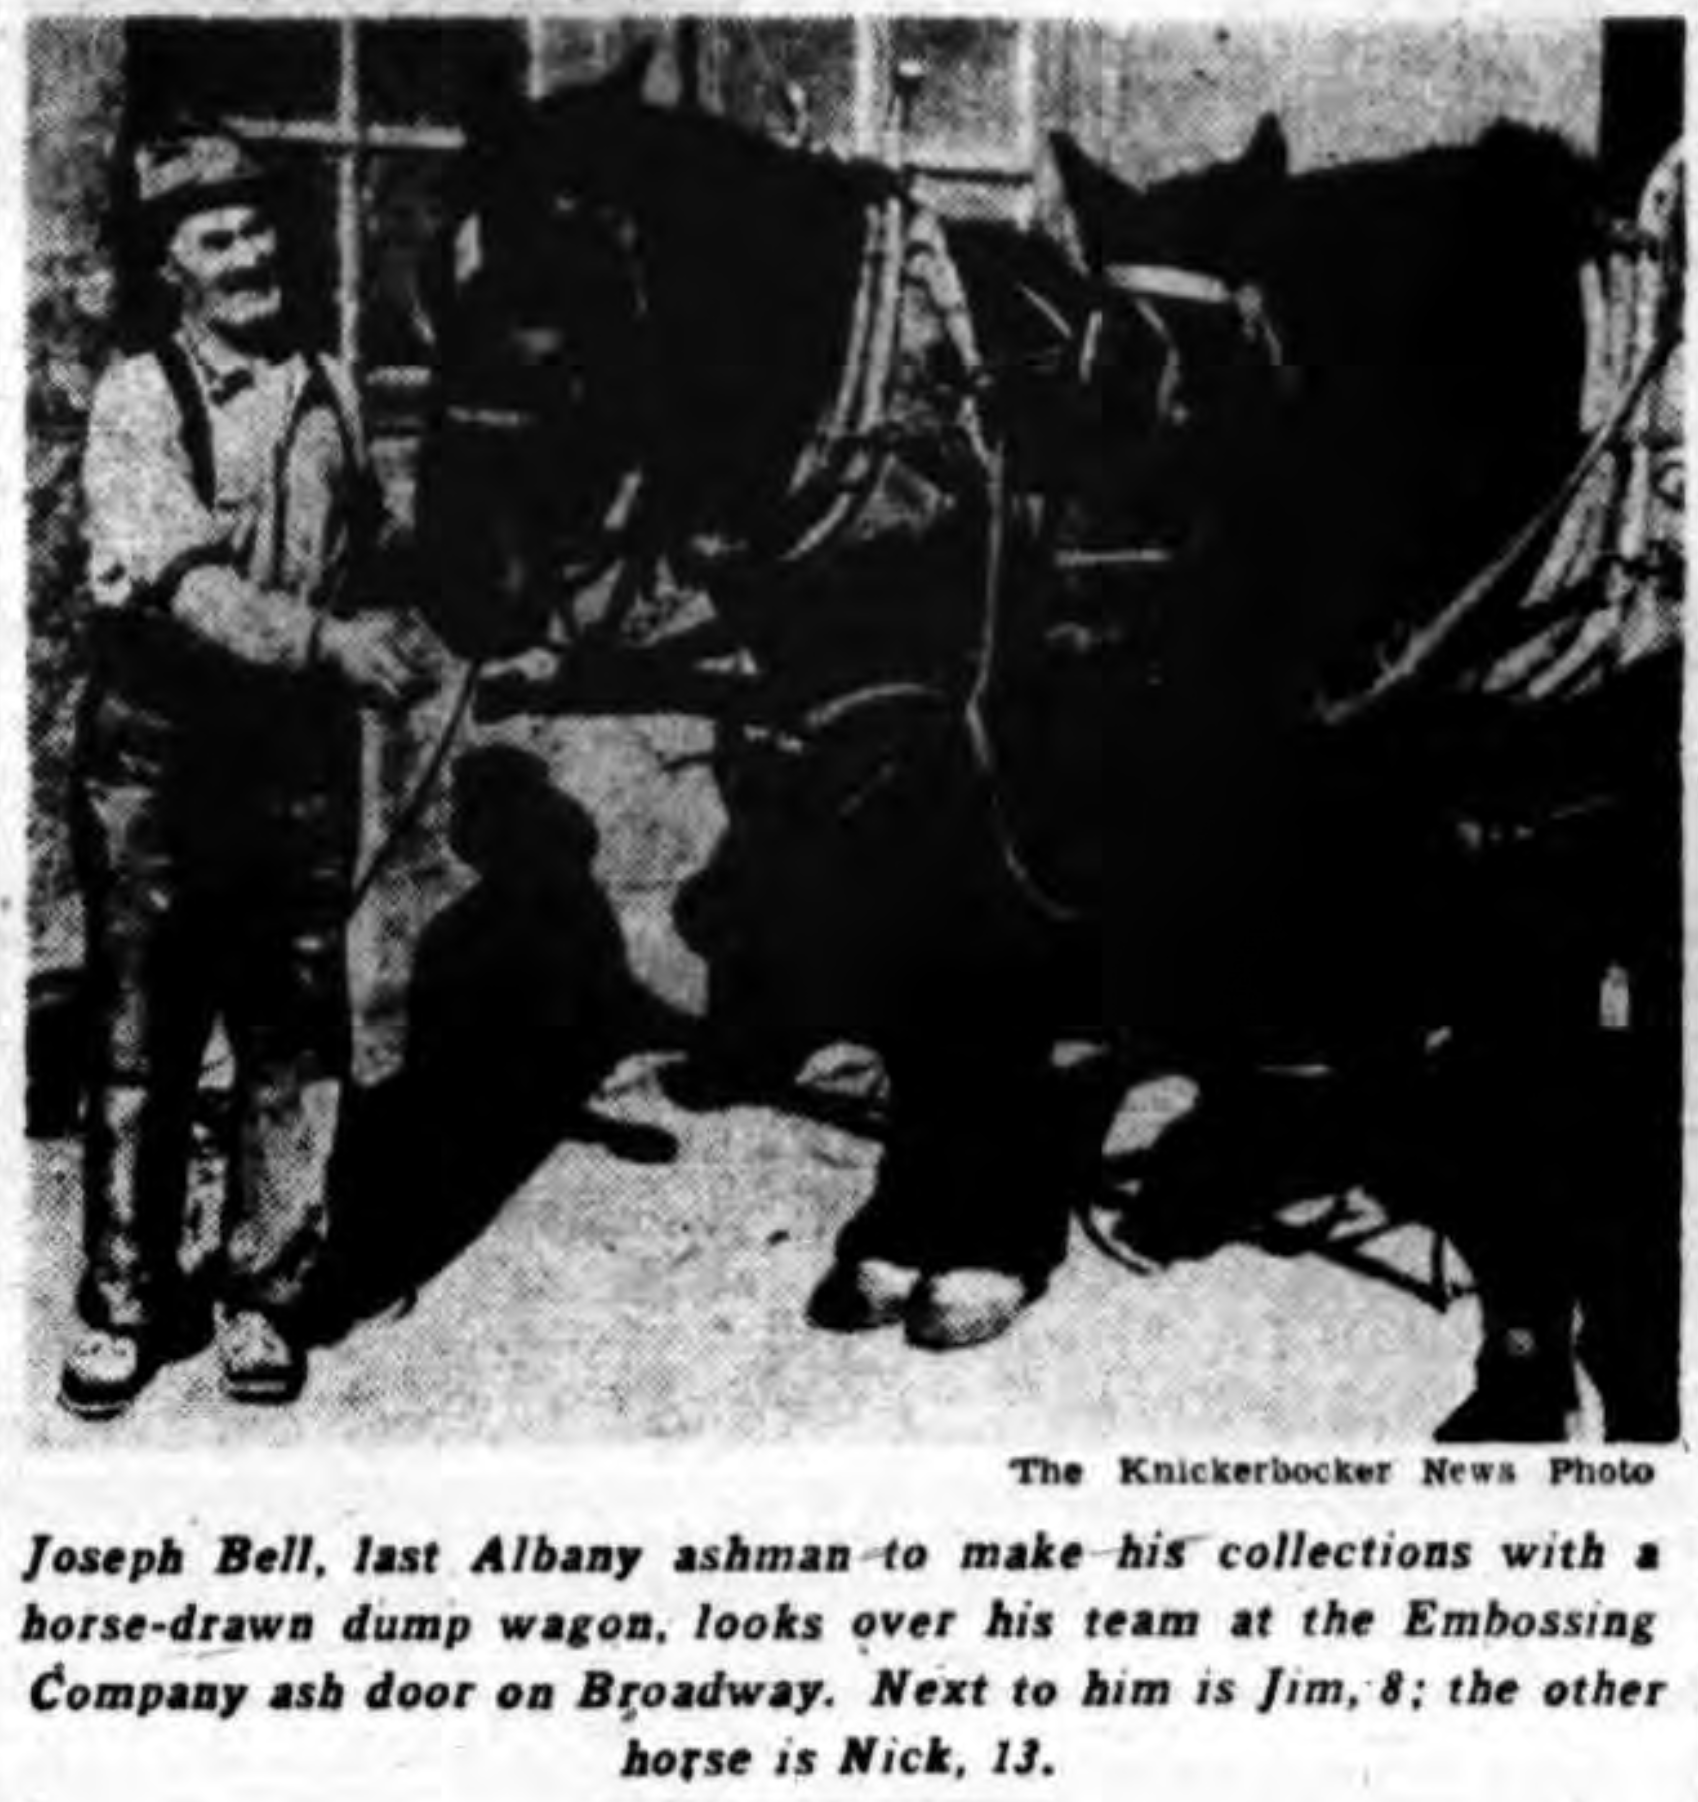 The Last Albany Ashman